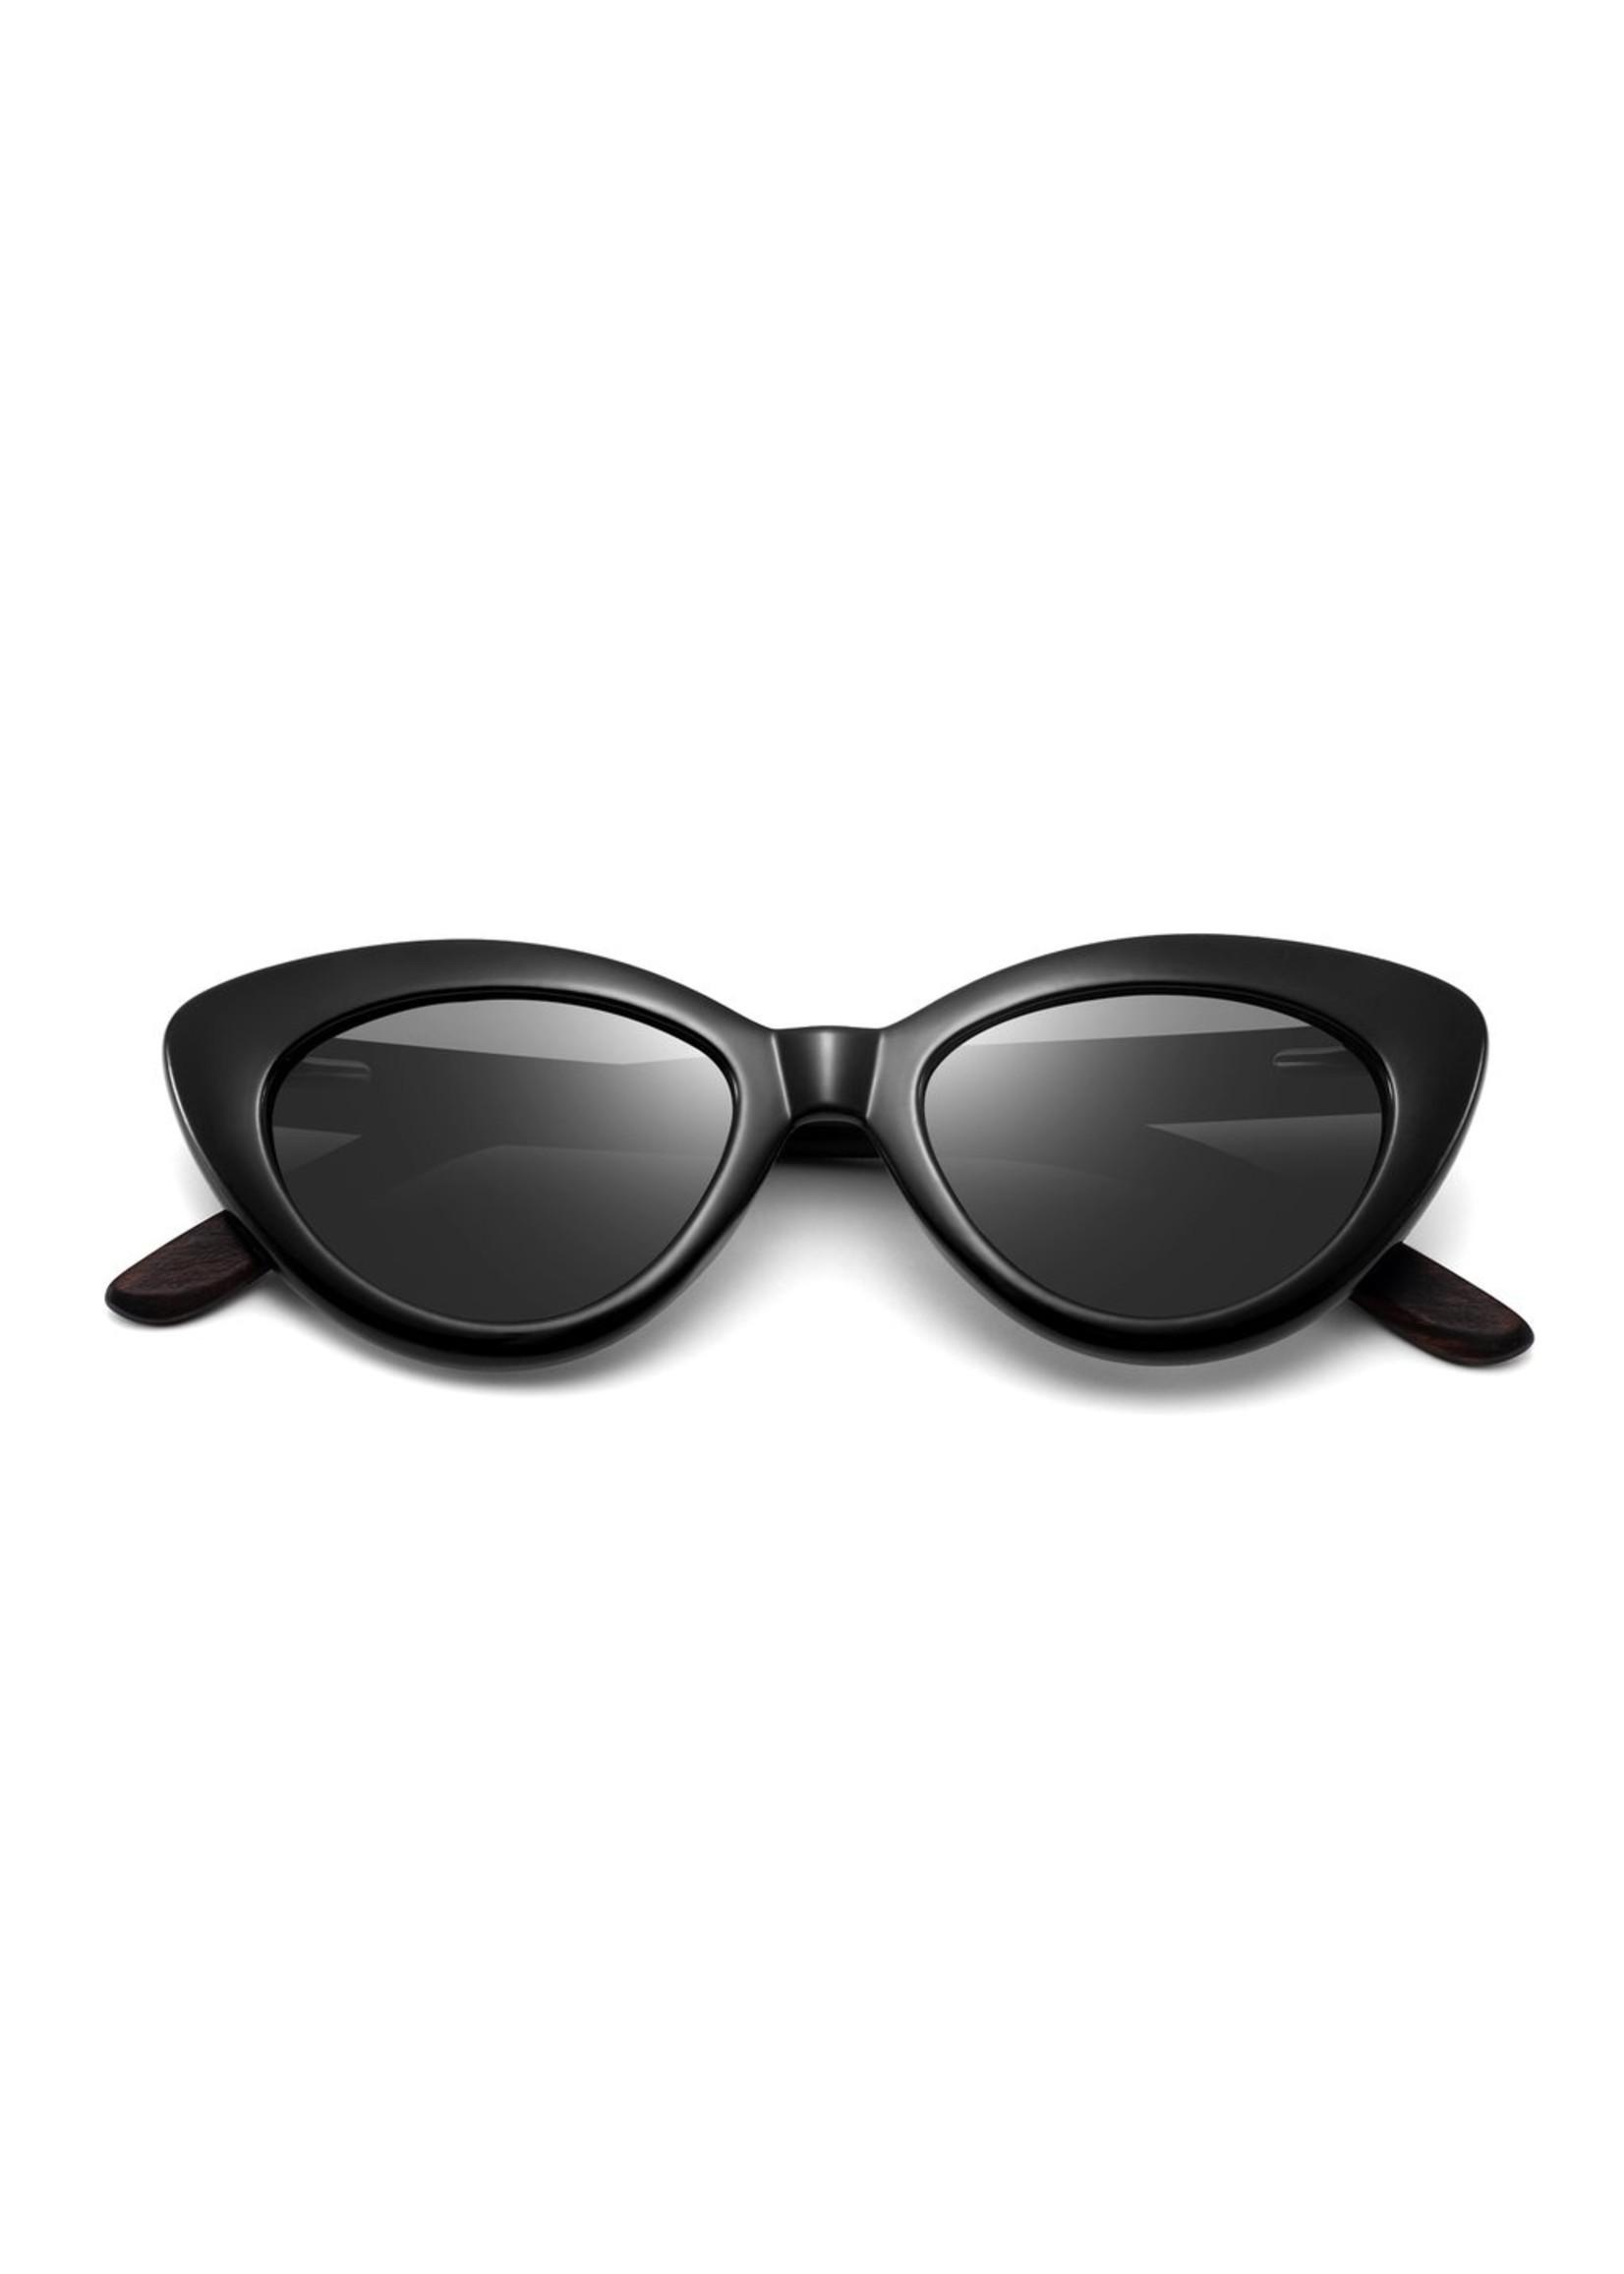 Kuma Sunglasses Paris - Black